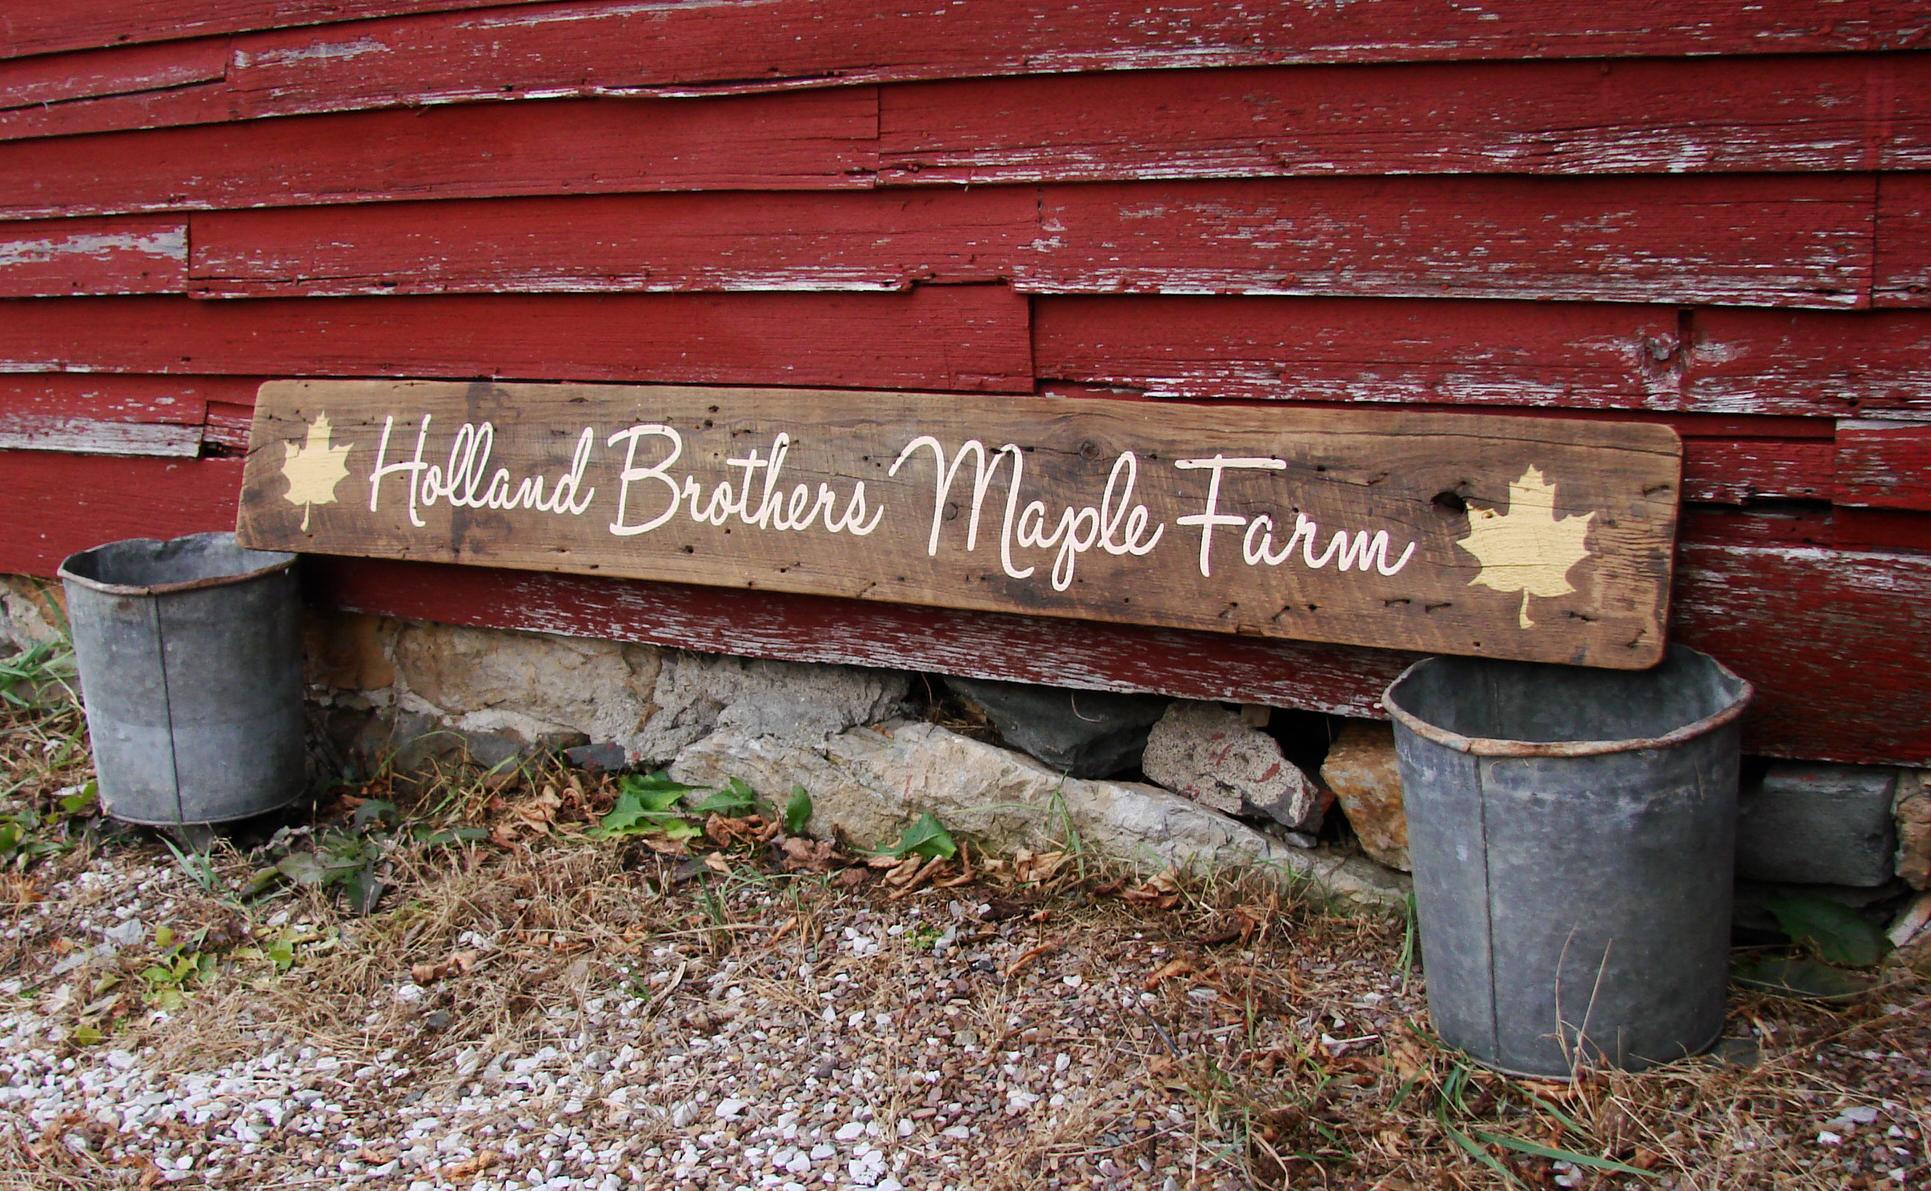 Holland Brothers Maple Farm